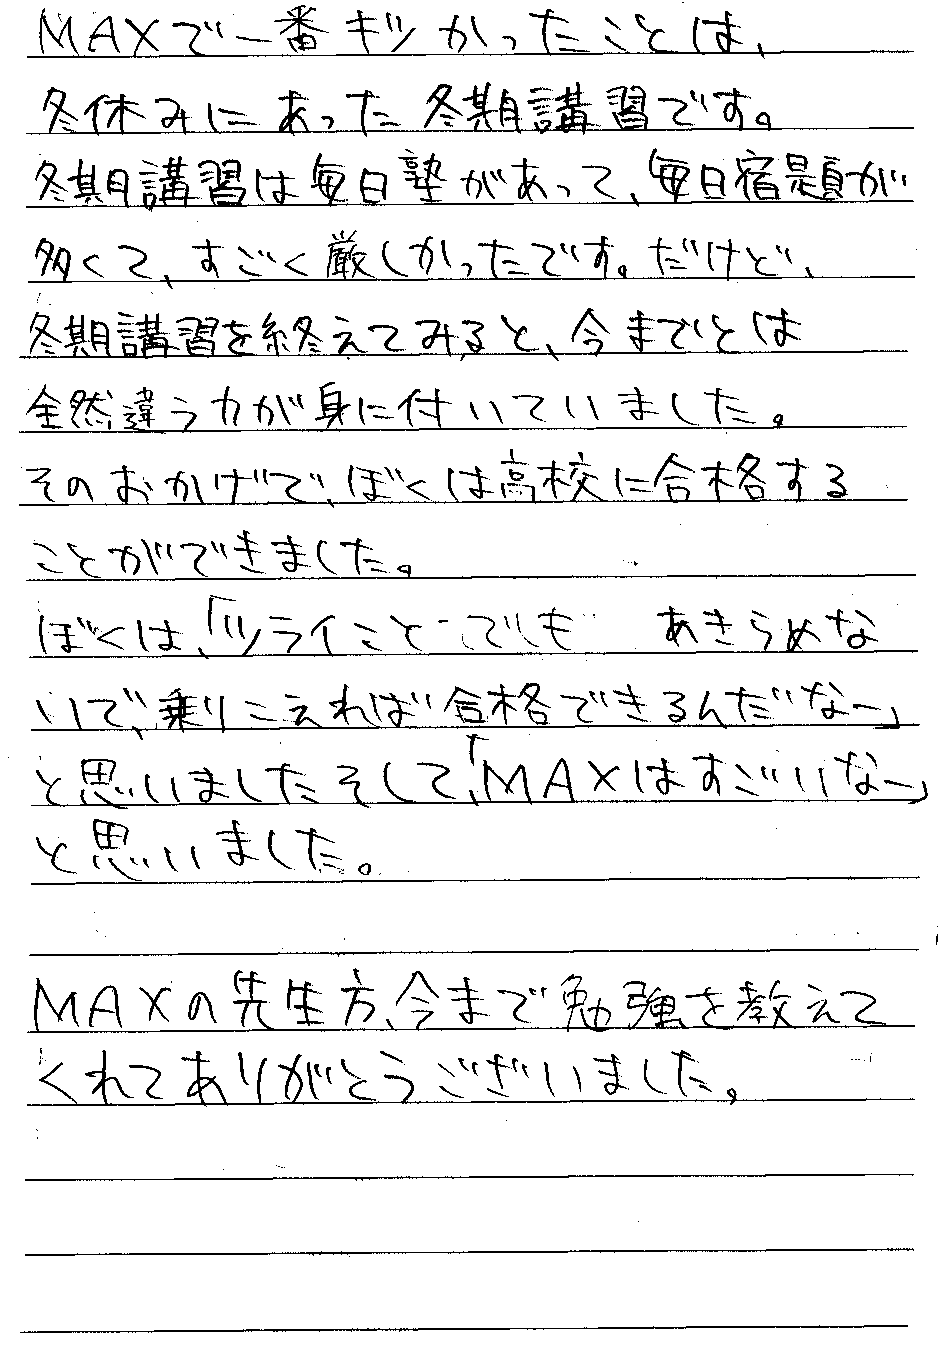 309-2